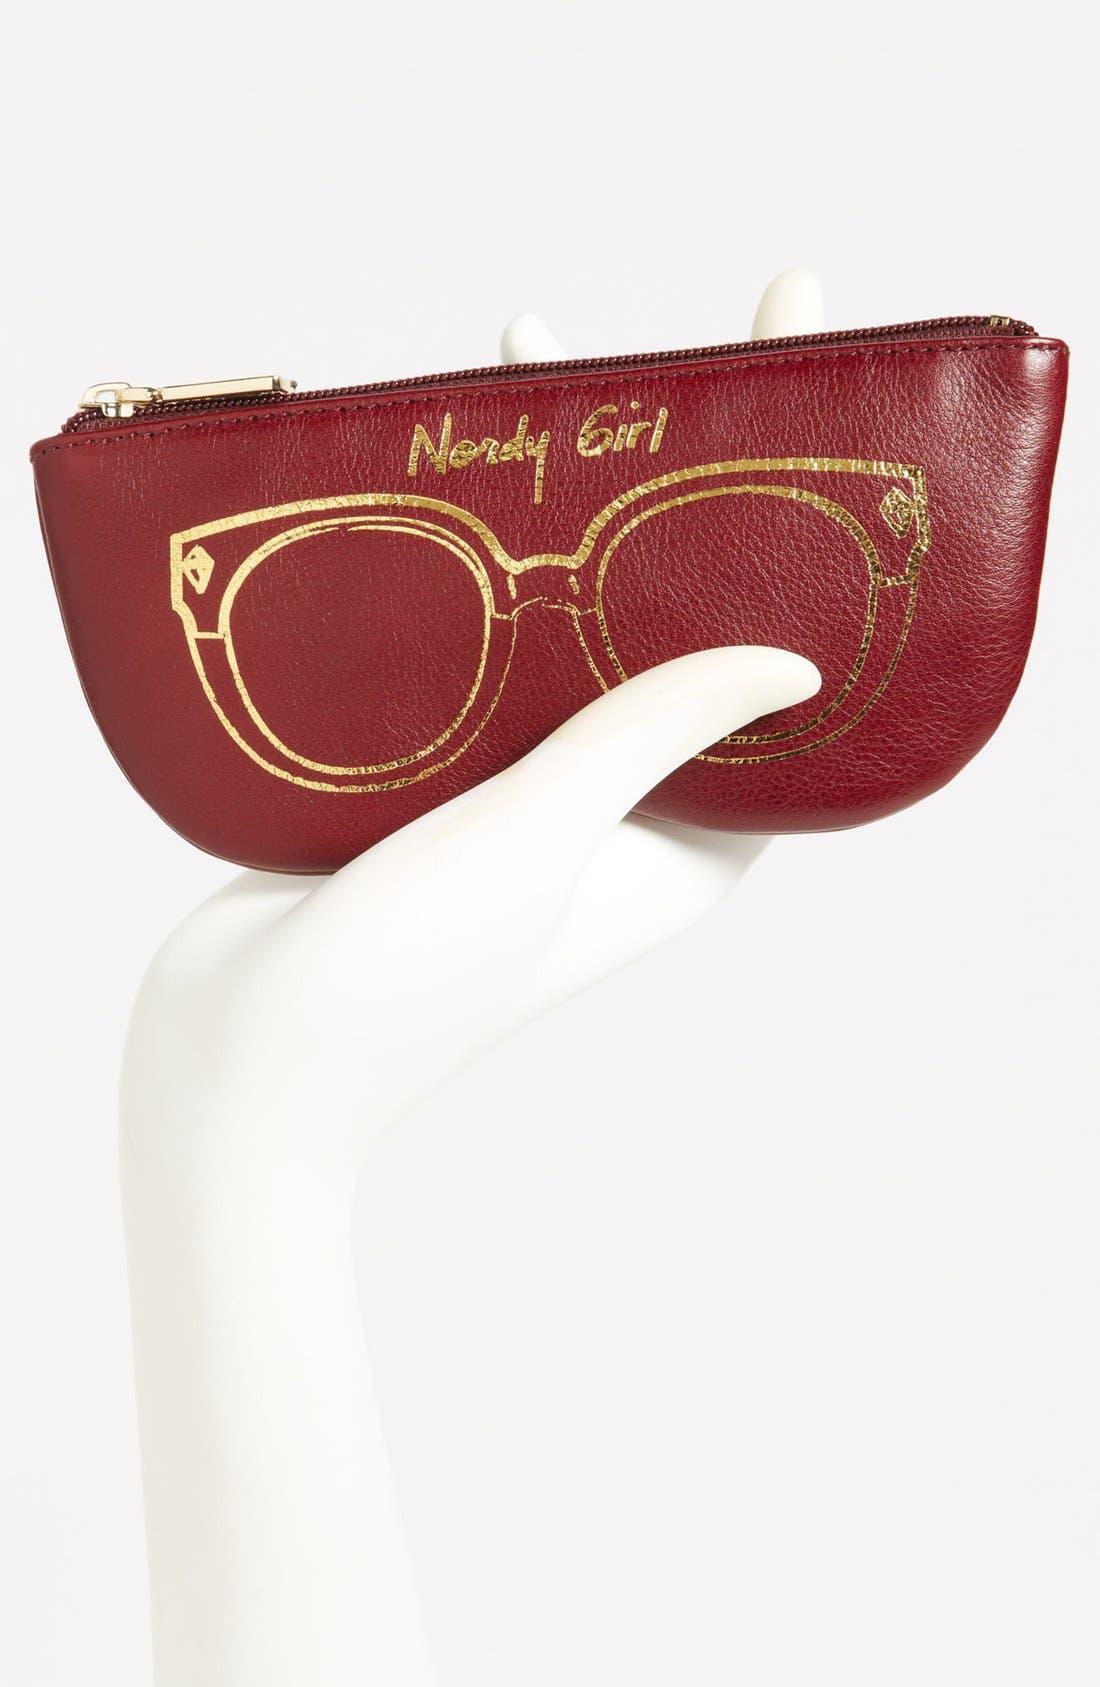 Alternate Image 2  - Rebecca Minkoff 'Nordy Girl' Leather Sunglasses Case